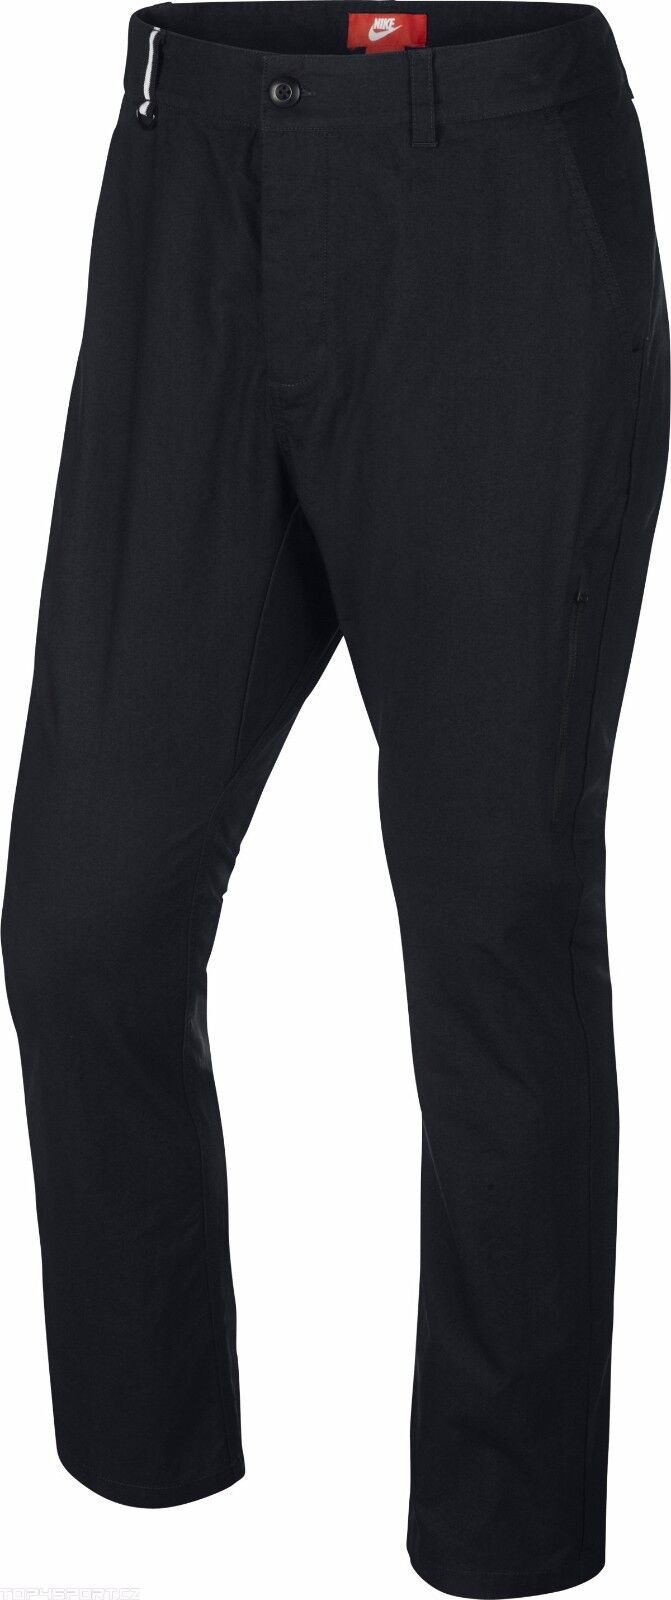 Nike [646603 010] Pants Nike Terrain Woven Size Large